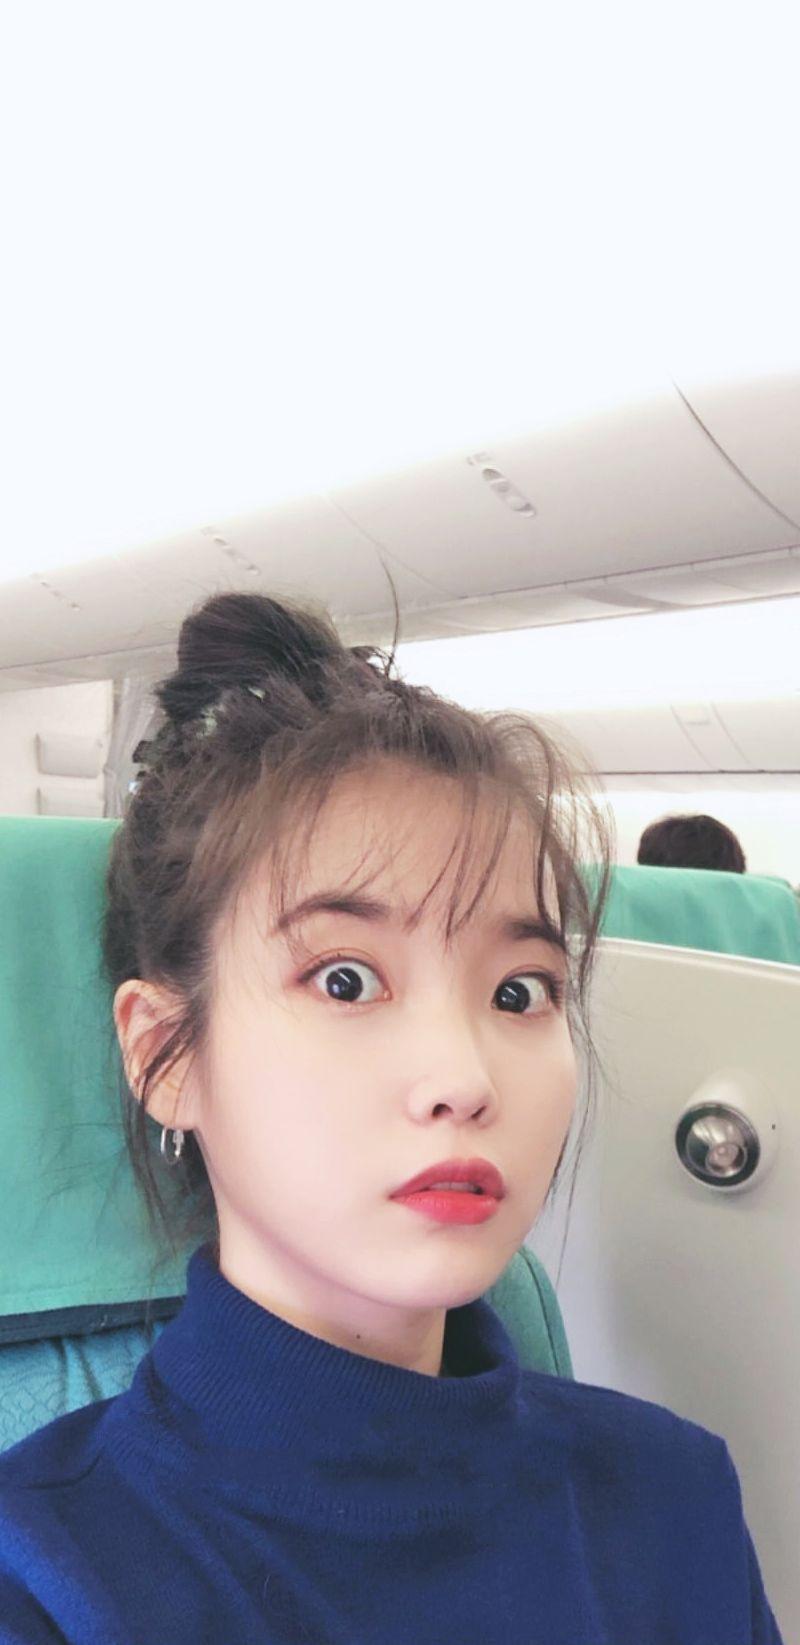 Iu Wallpapers Lockscreen In 2020 Iu Hair Beautiful Girl Face Kpop Girls